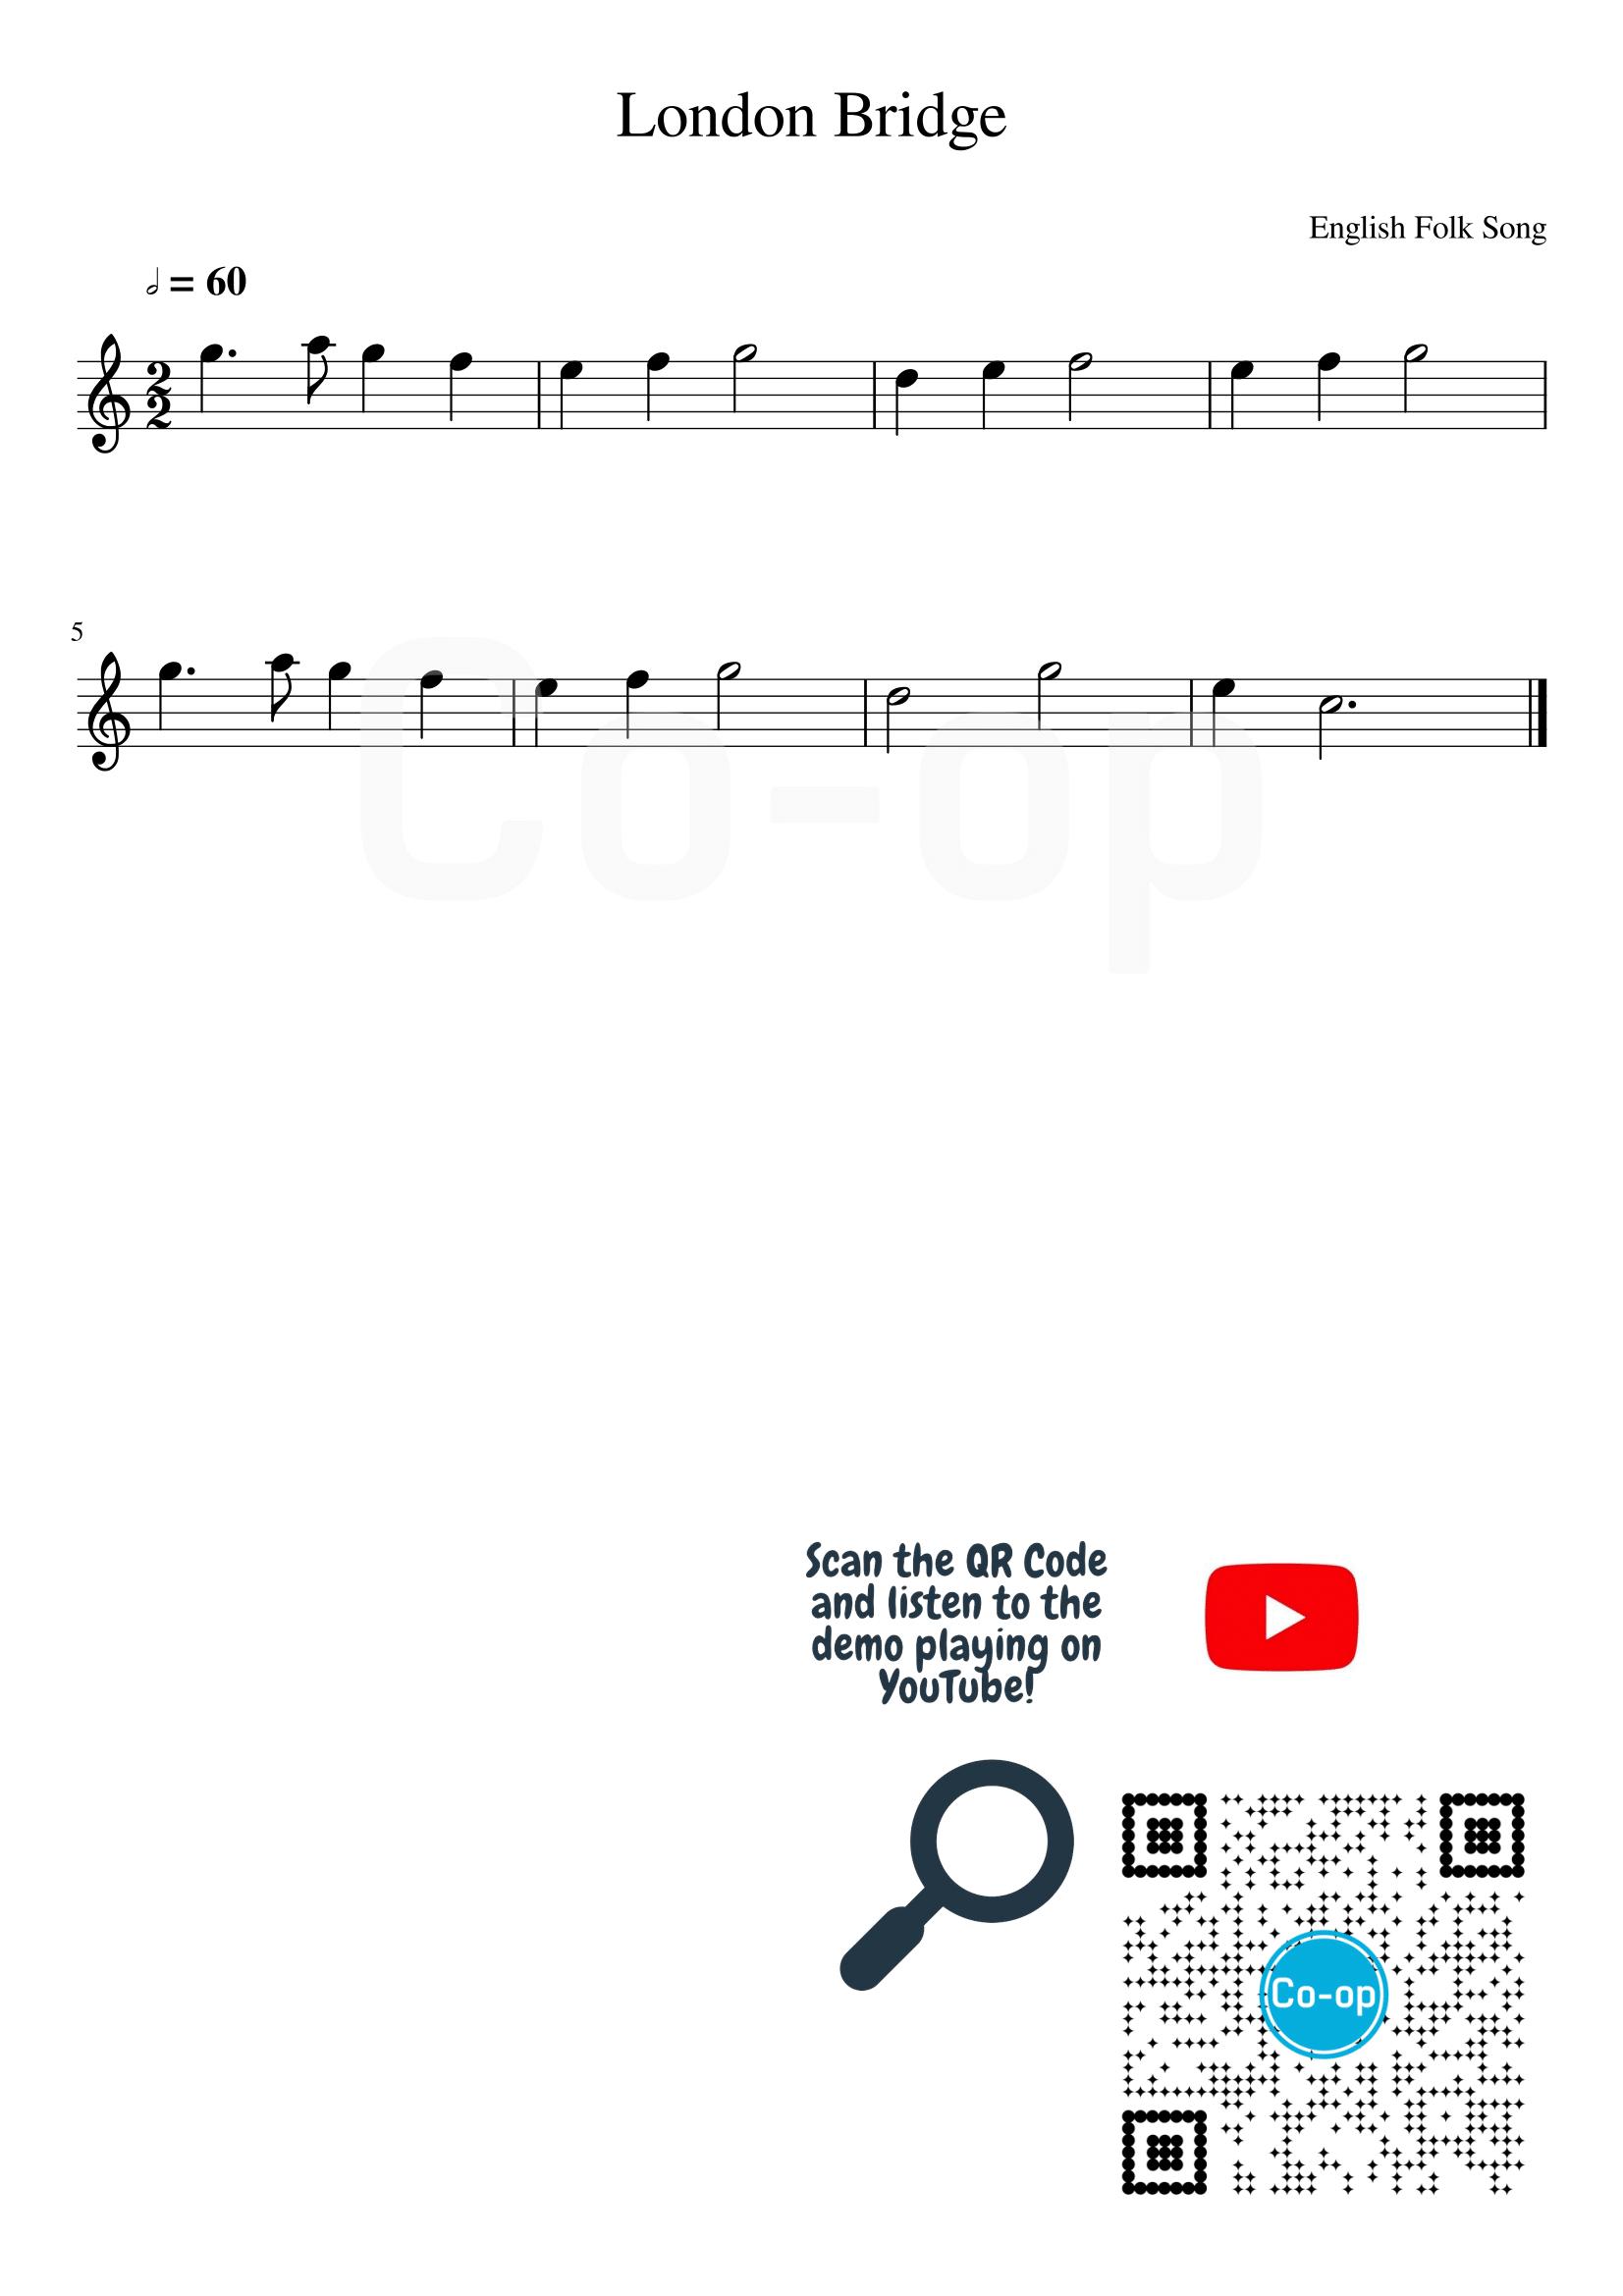 London Bridge | Staff Notation | Free Sheet Music